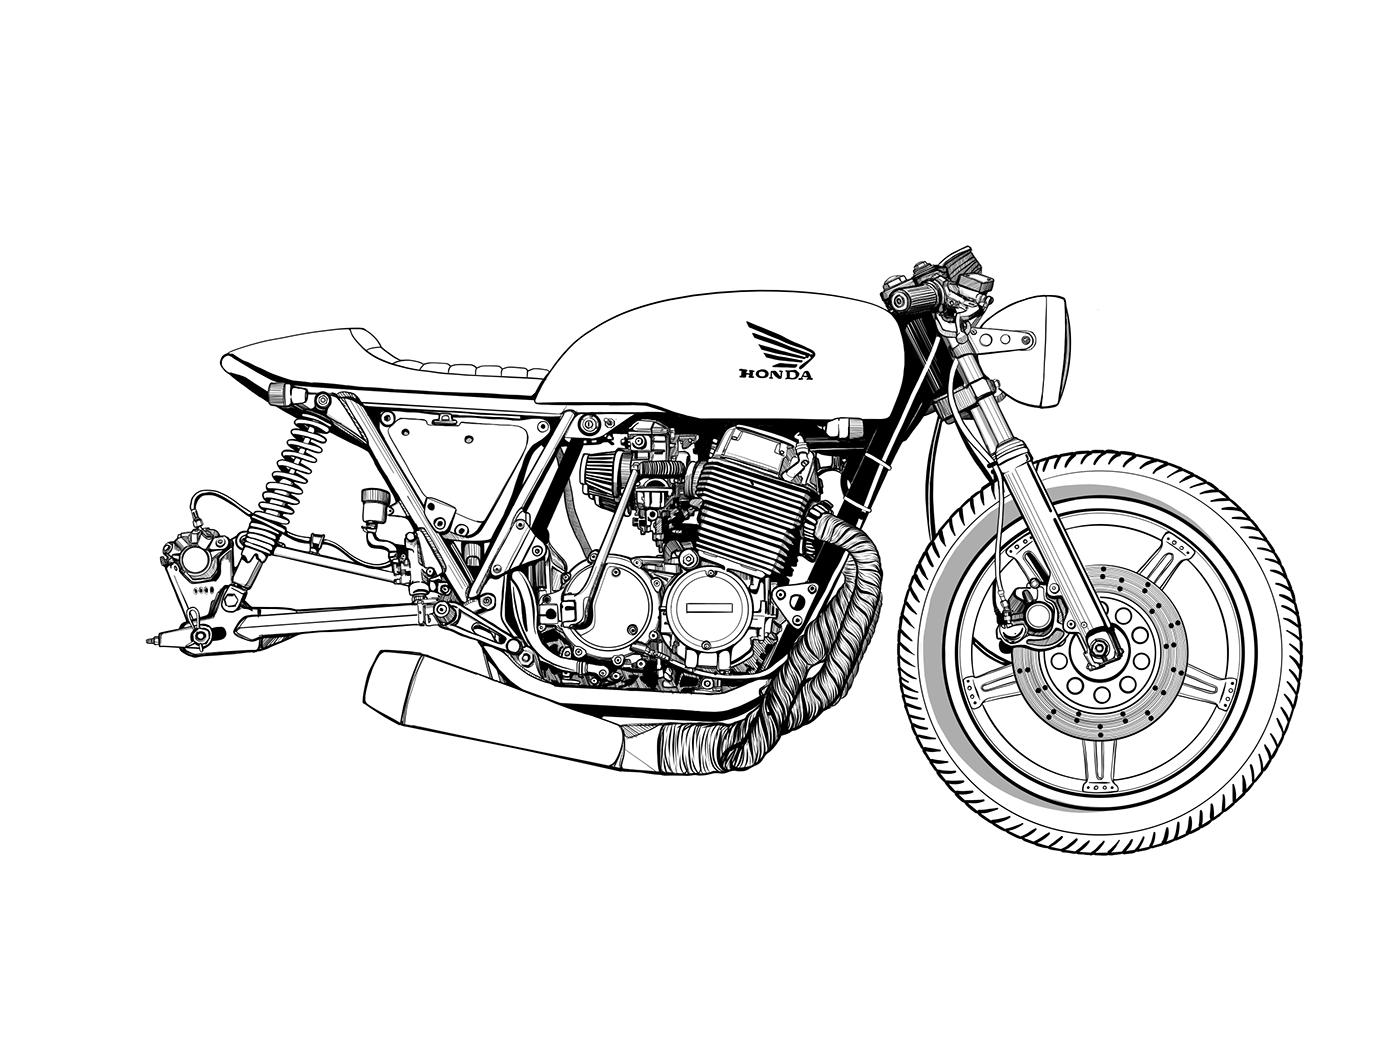 Cafe Racer Cafe Racer Drawing